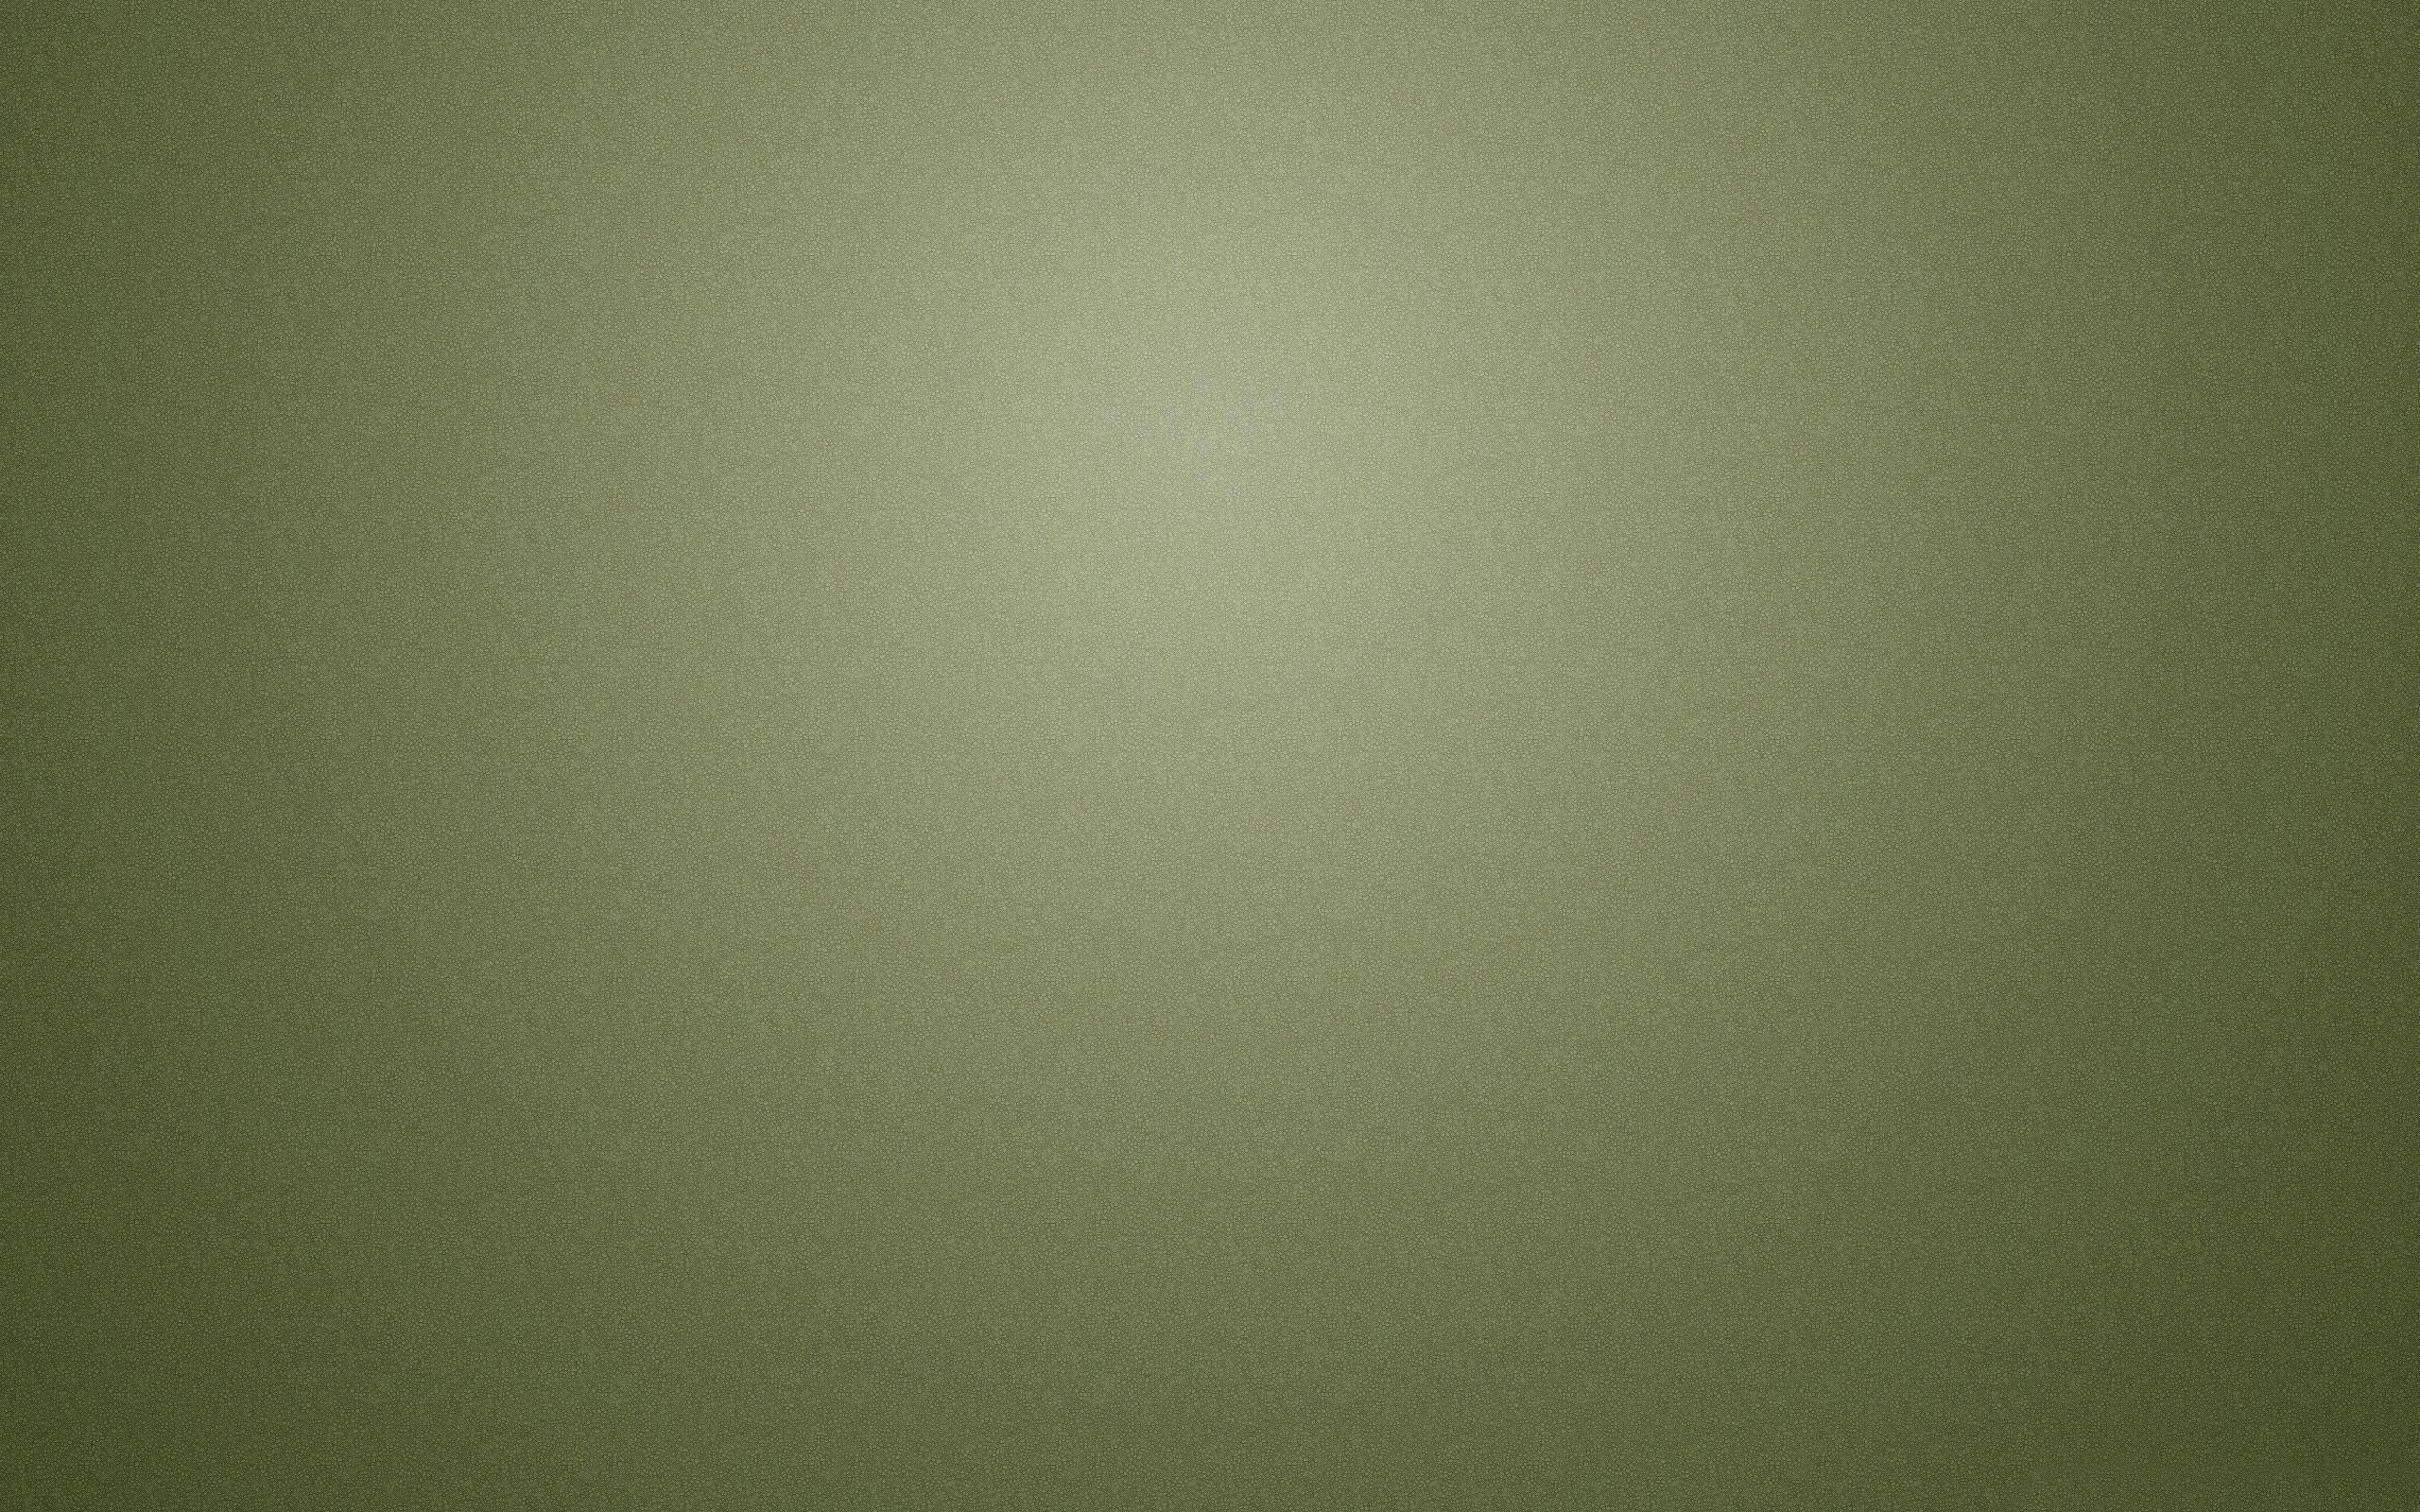 Olive background Mac Wallpaper Download | Free Mac ...